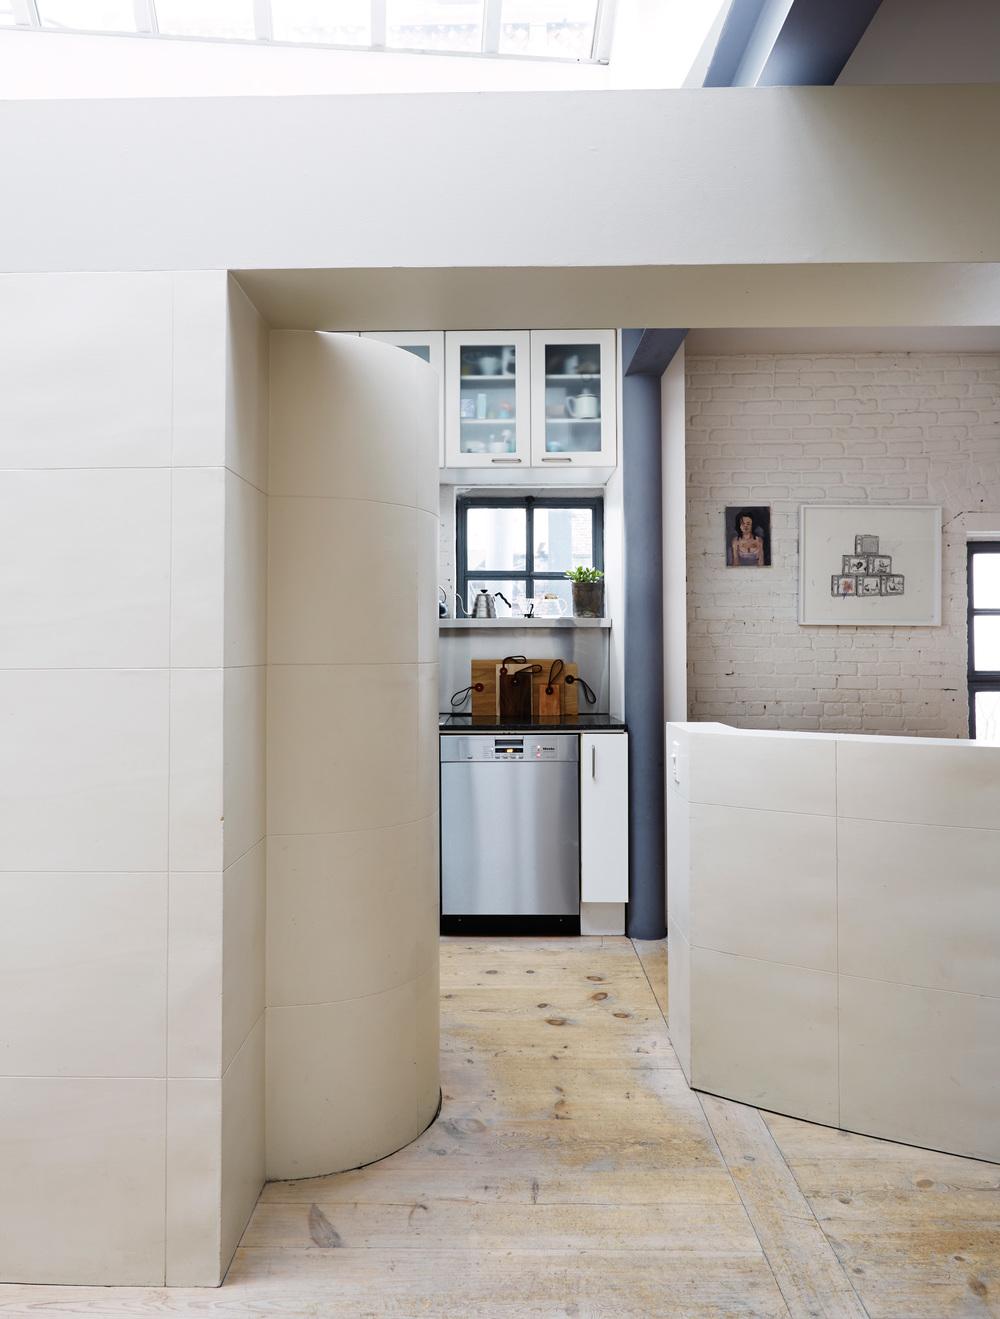 soren rose harrison st7 Light Mid century Modern in NYC